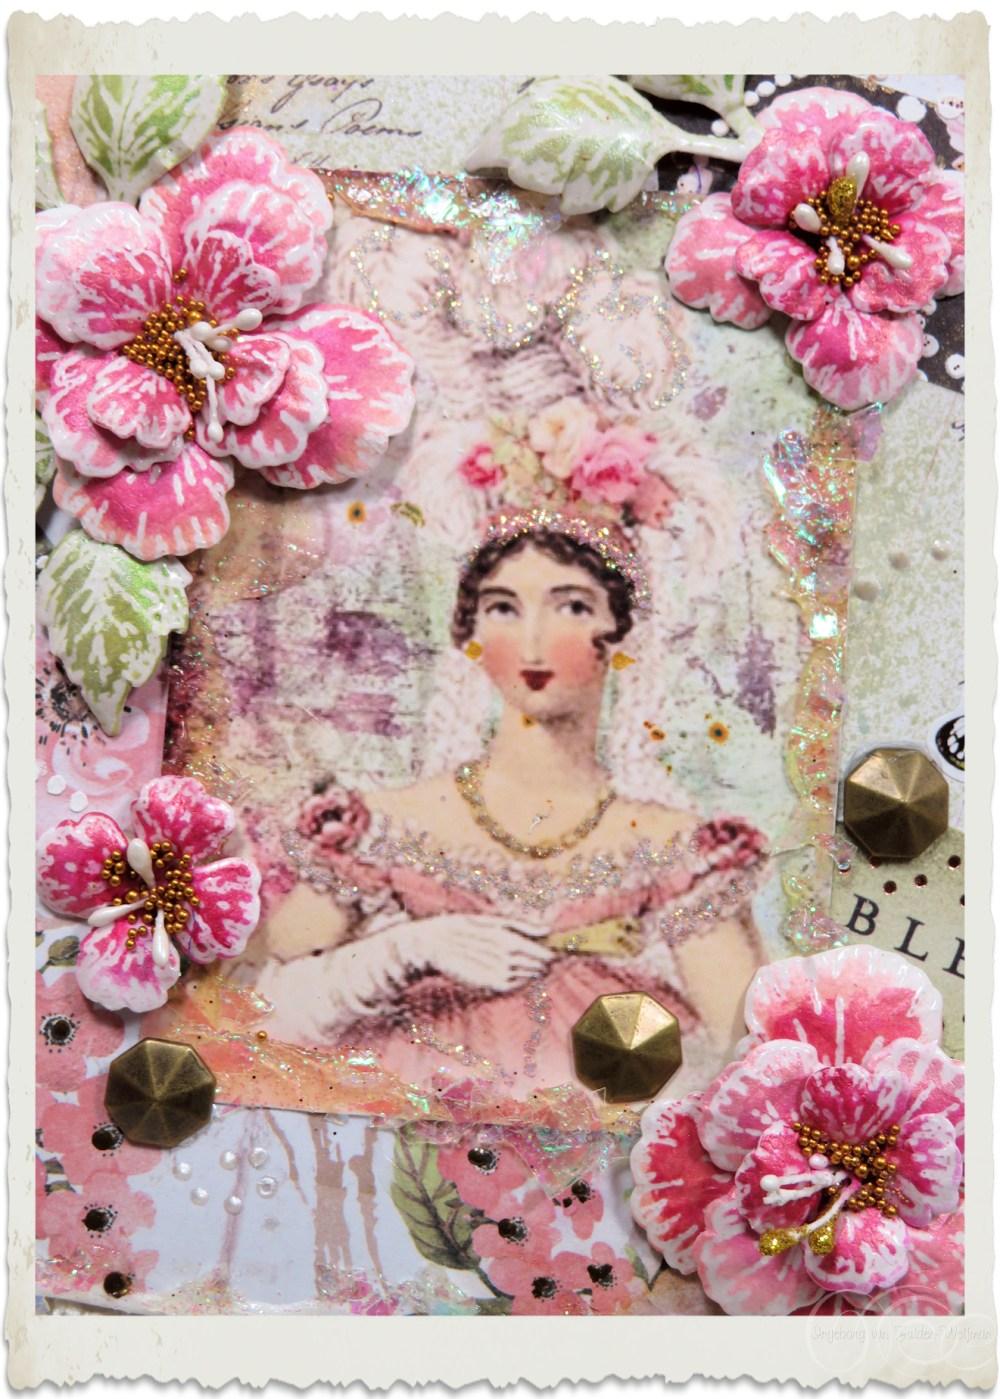 Pretty lady in pink by Ingeborg van Zuiden